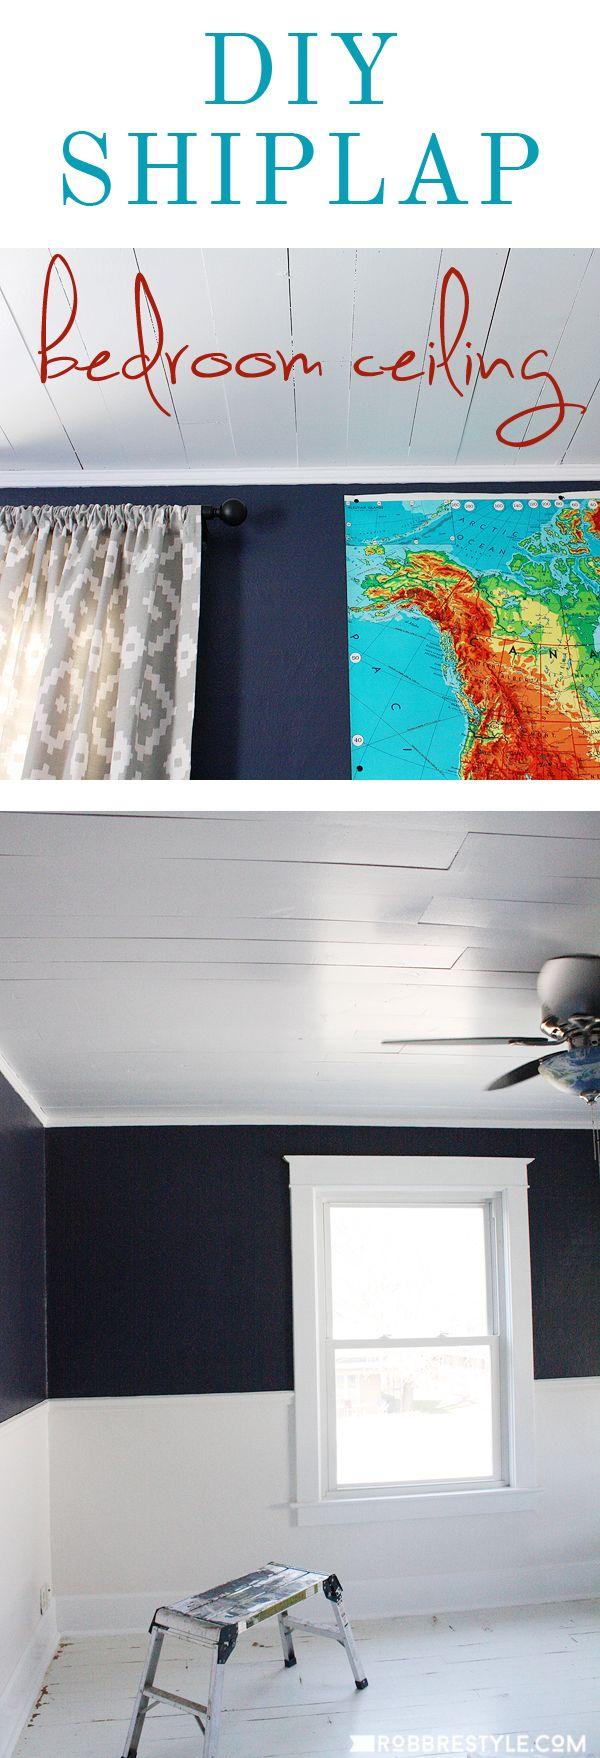 DIY Shiplap Bedroom Ceiling with Ryobi Miter Saw